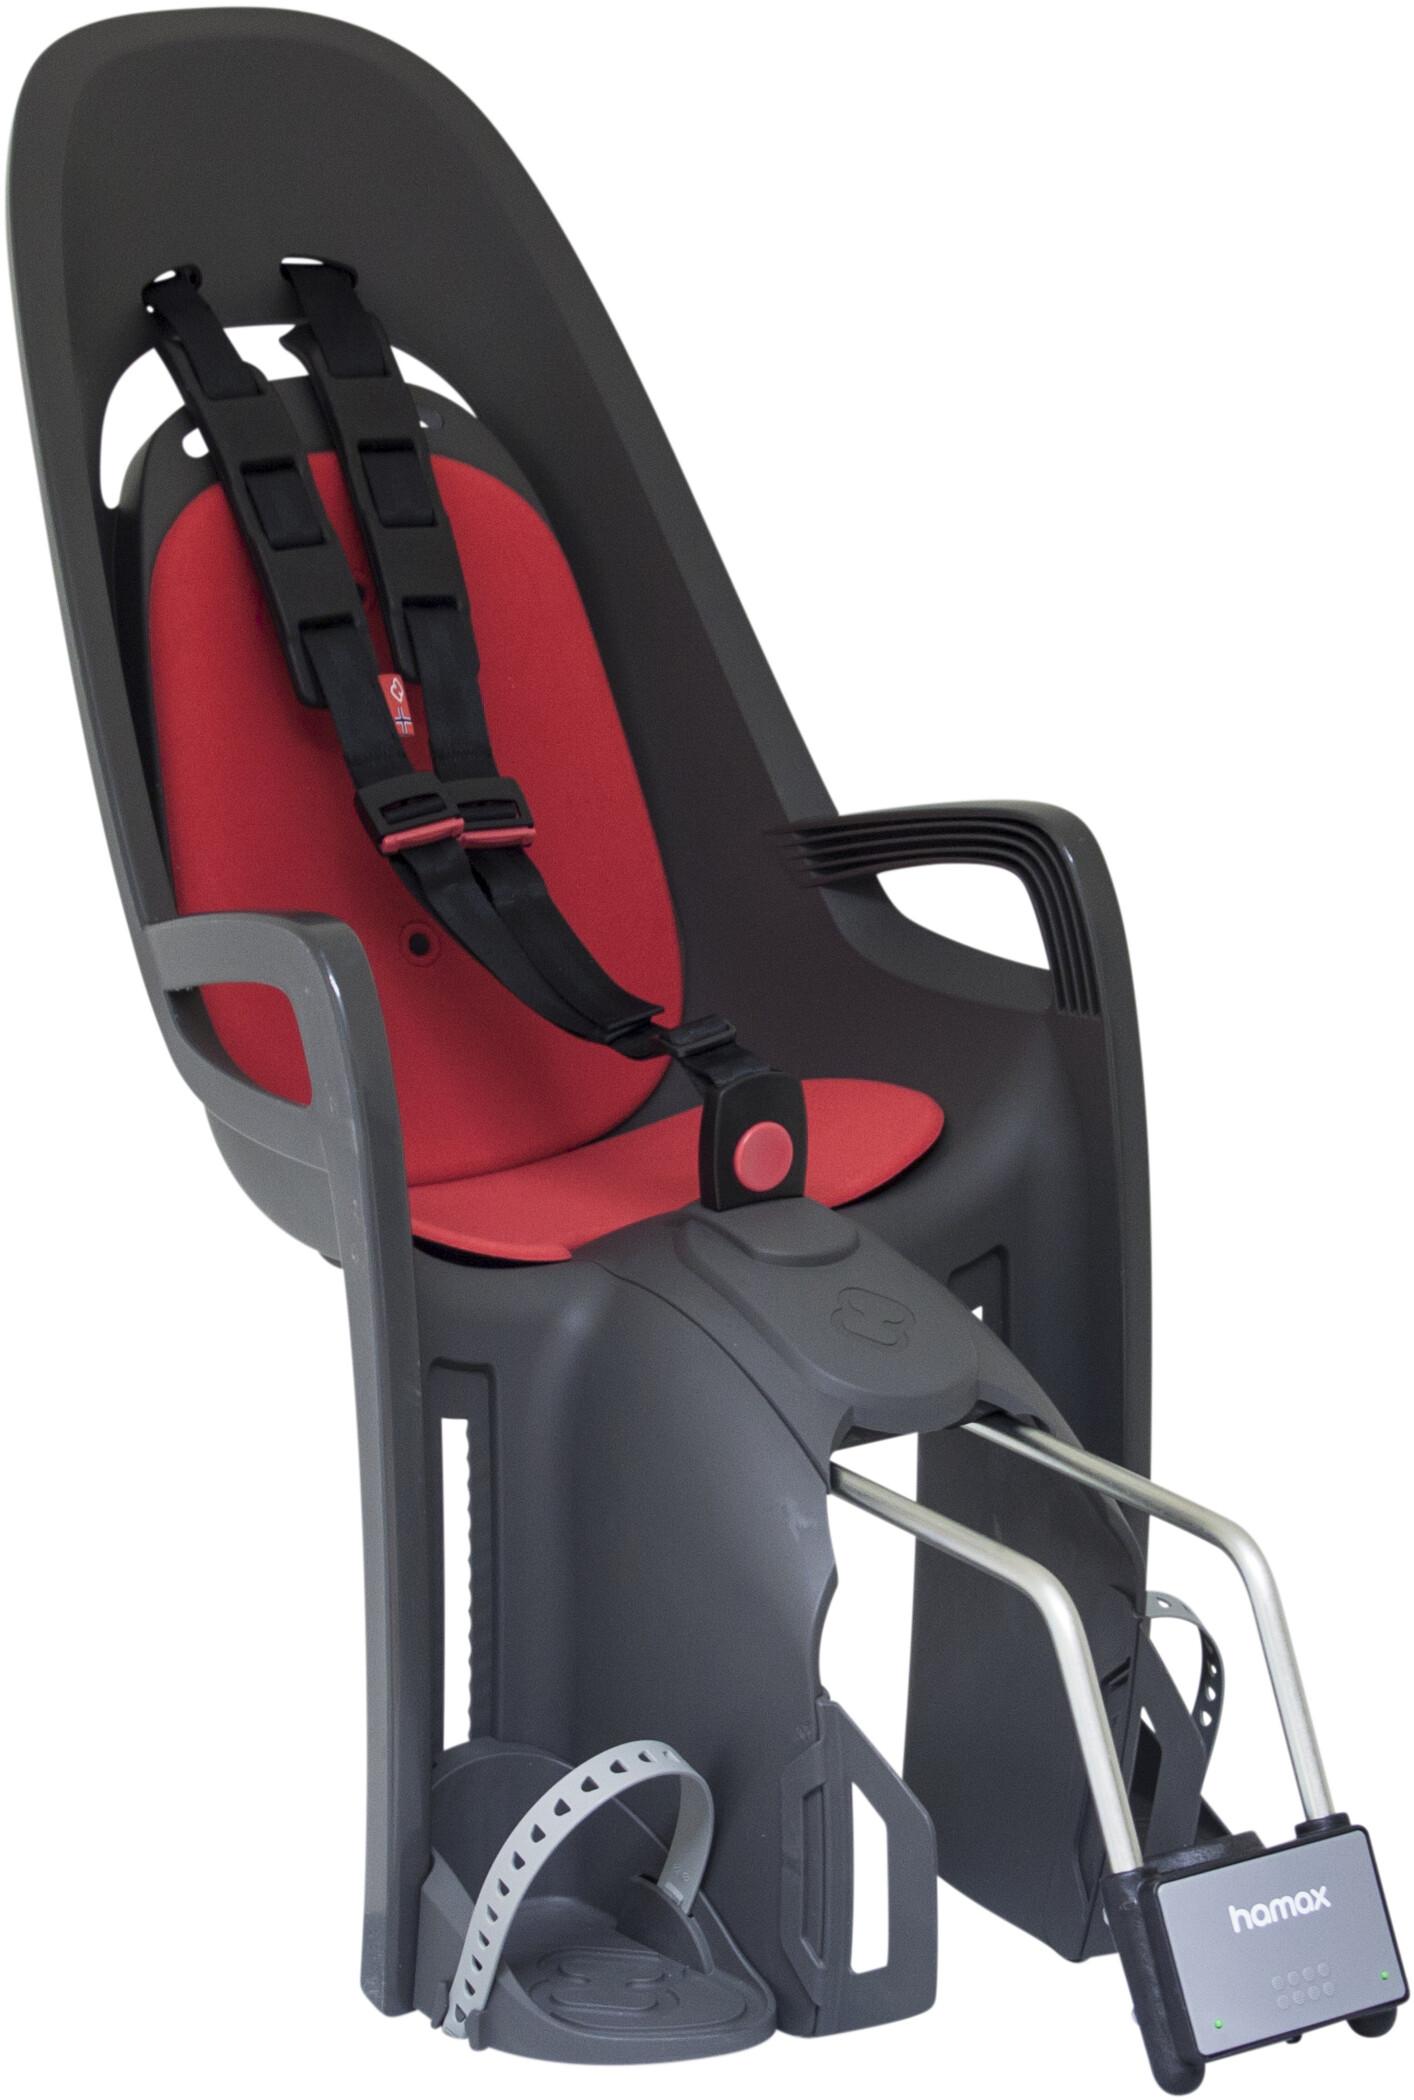 Hamax Zenith Barnestol, grey/red (2019) | Bike seat